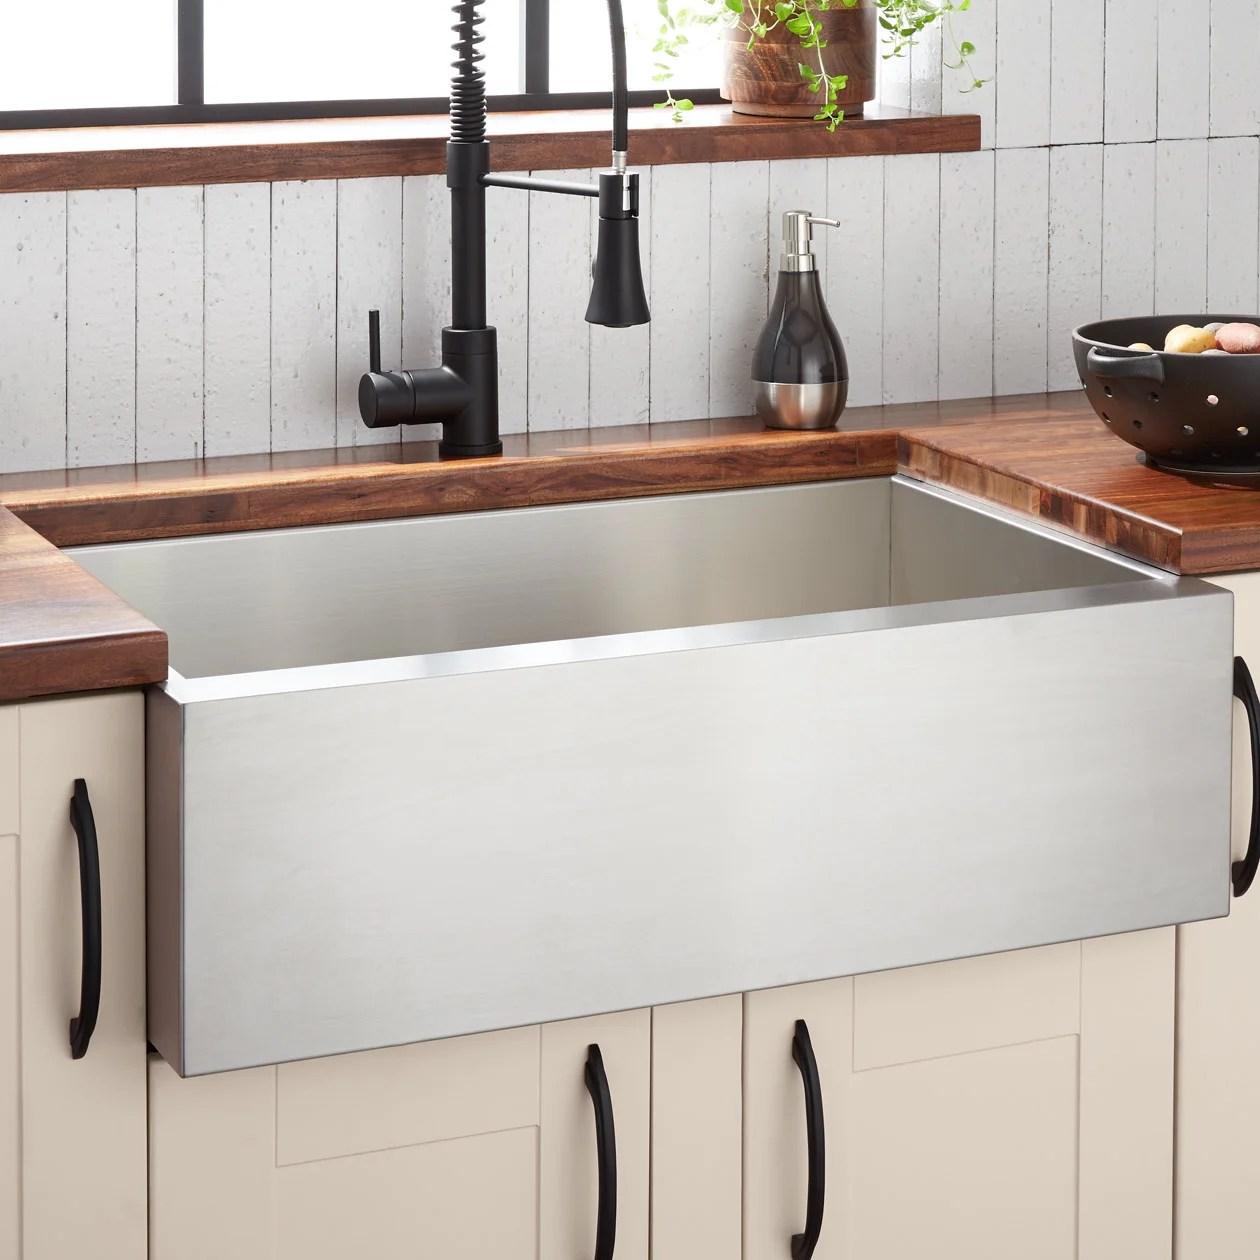 signature hardware 33 sitka stainless steel farmhouse sink